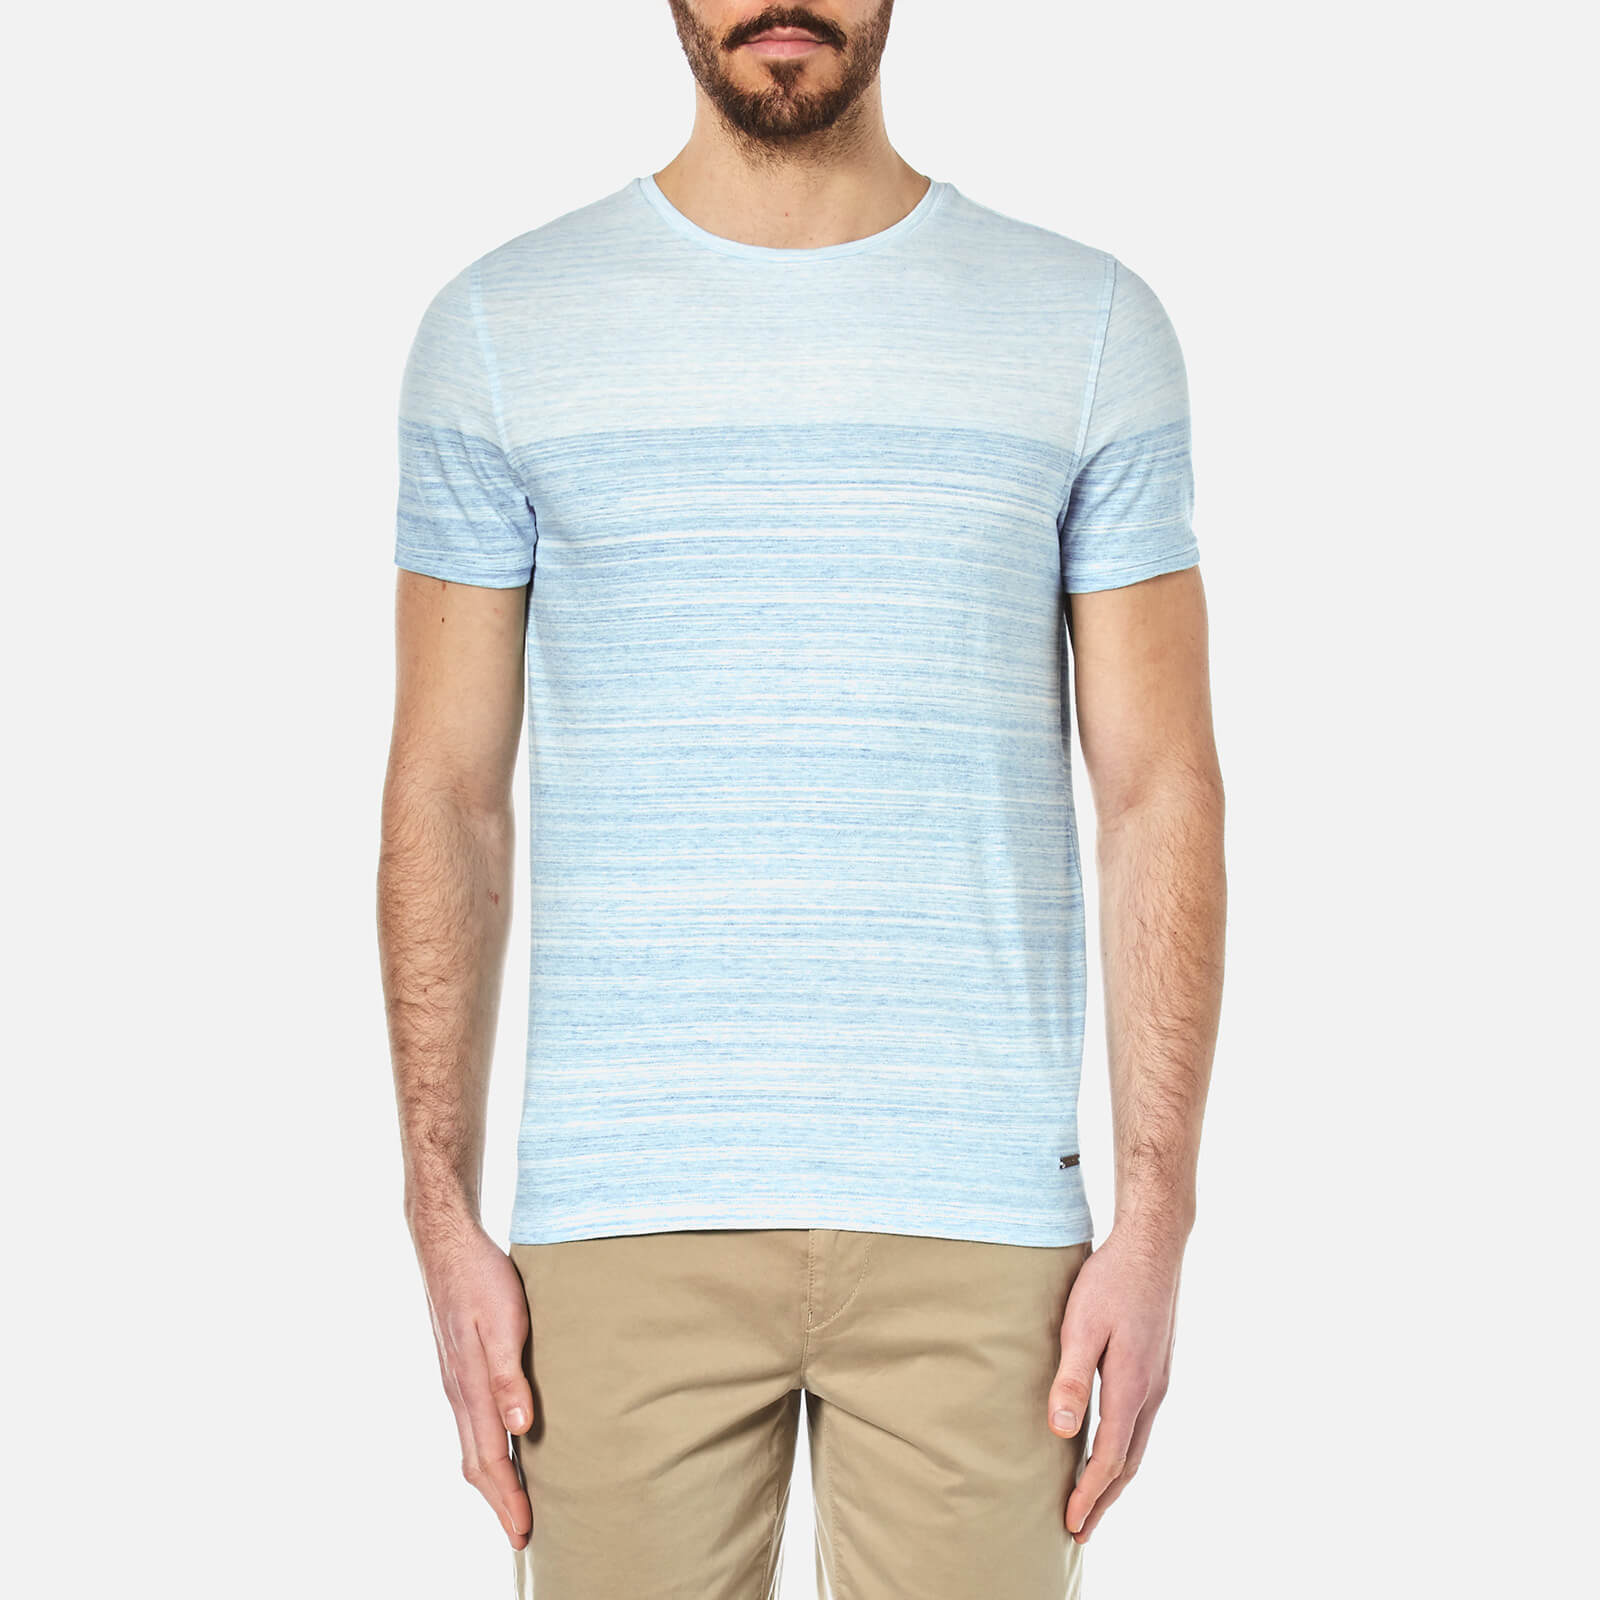 c8c373632 BOSS Orange Men's Trumble Striped T-Shirt - Bright Blue - Free UK Delivery  over £50